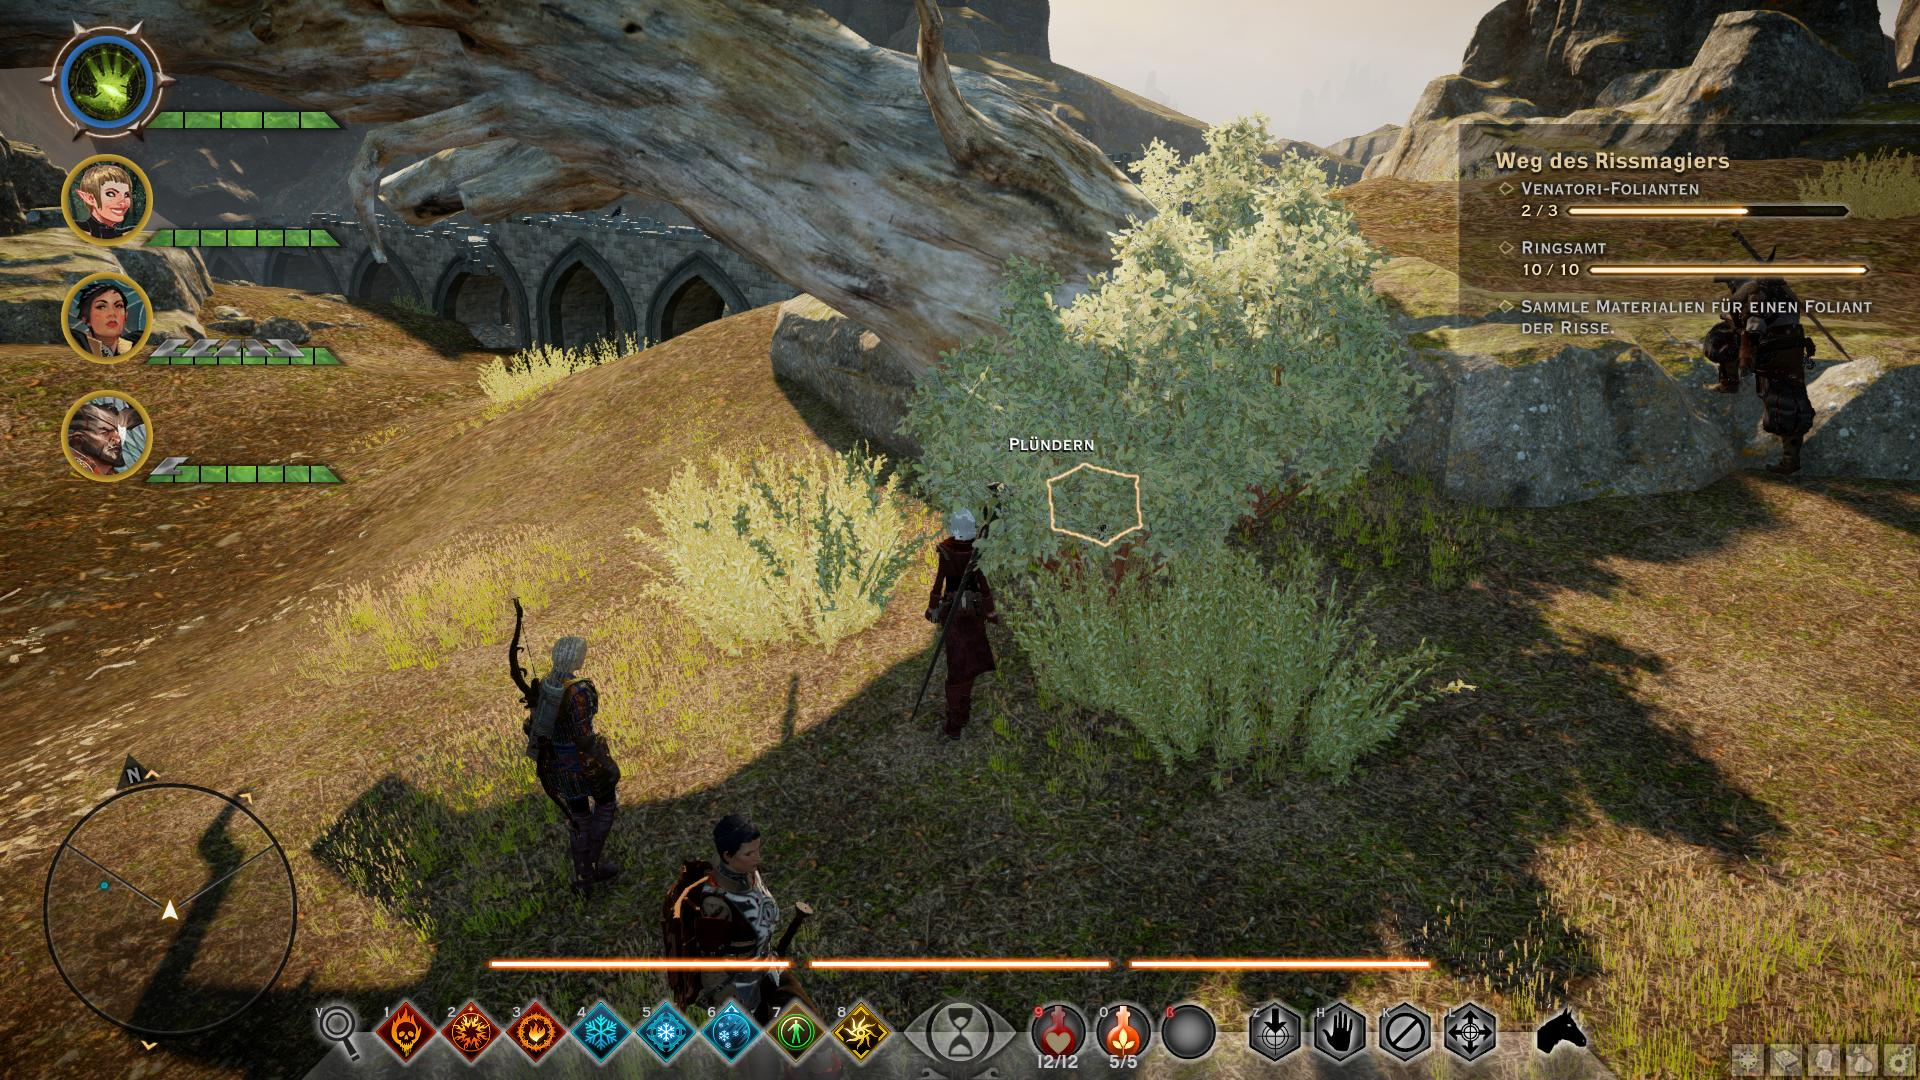 Dragon Age Wertgegenstände